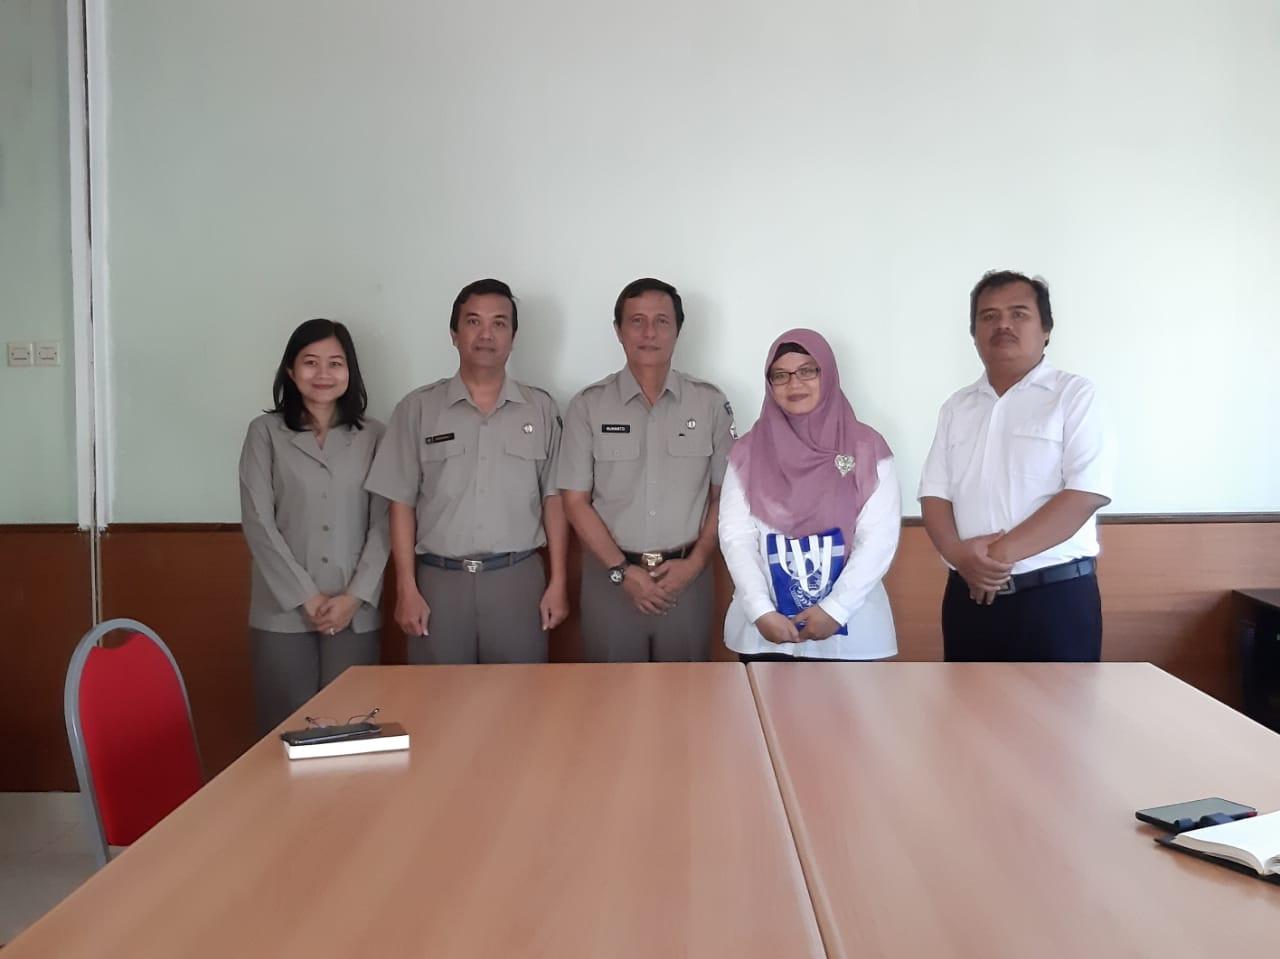 Kunjungan dari Sekolah Tinggi Teknologi Adisutjipto dalam rangka penjajagan kerjasama